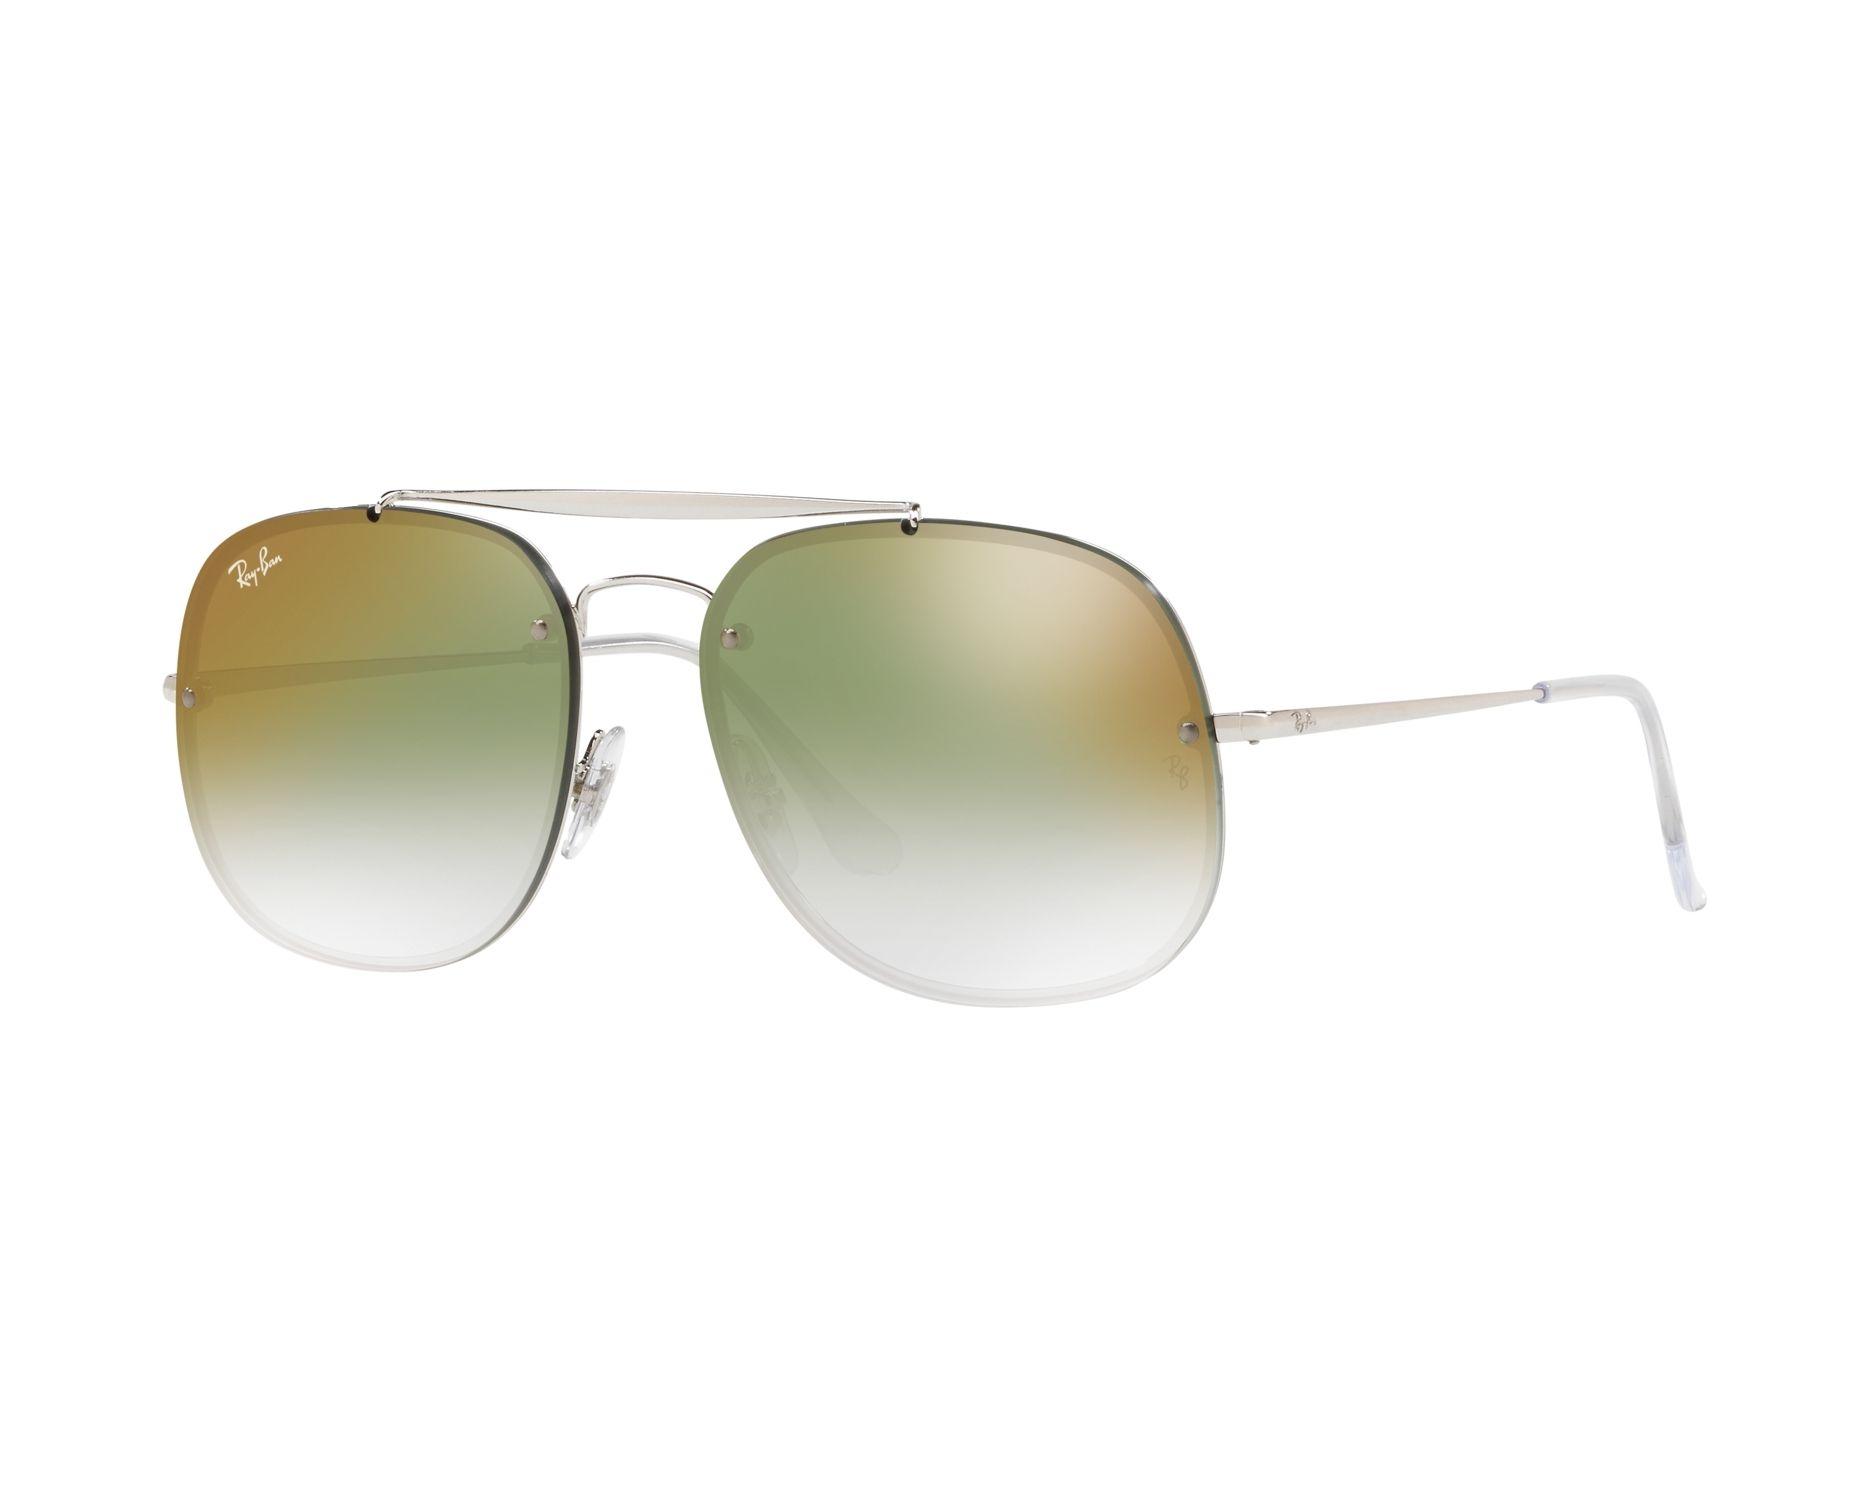 bcfa9bfc657 Sunglasses Ray-Ban RB-3583-N 003 W0 58-16 Silver